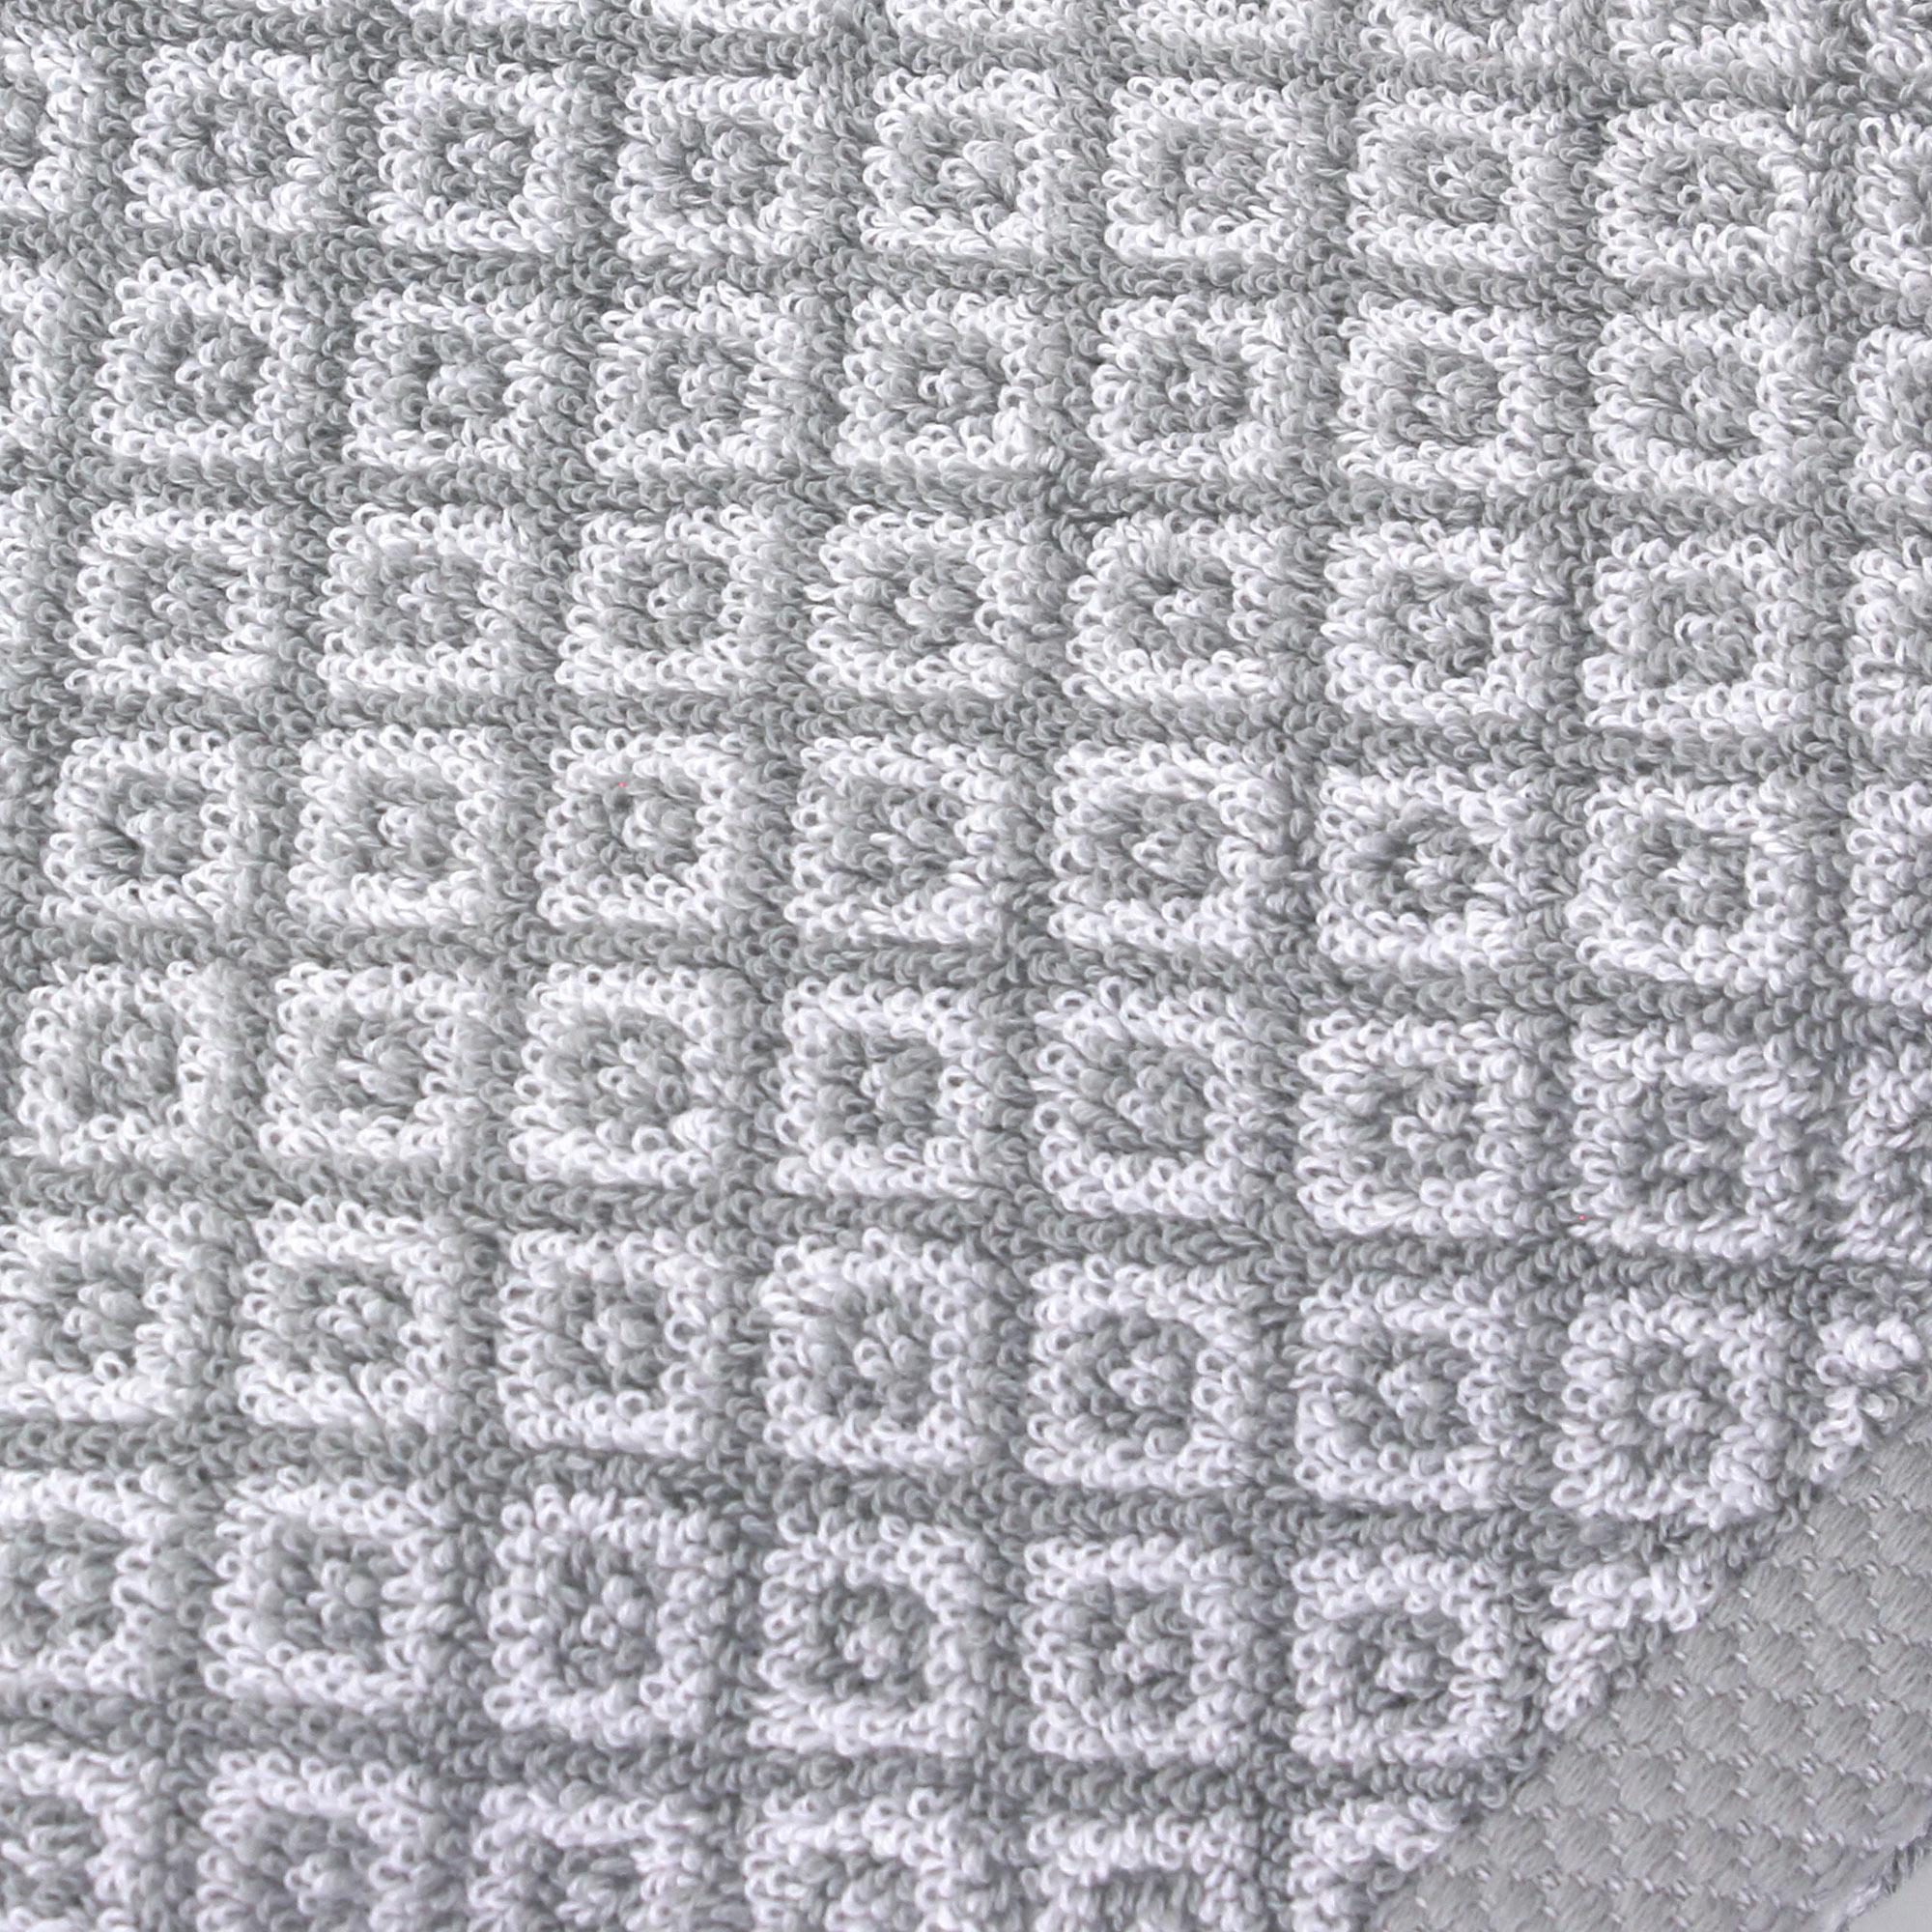 drap de bain 100x150 shibori mosaic gris 100 coton 500g m2 ebay. Black Bedroom Furniture Sets. Home Design Ideas